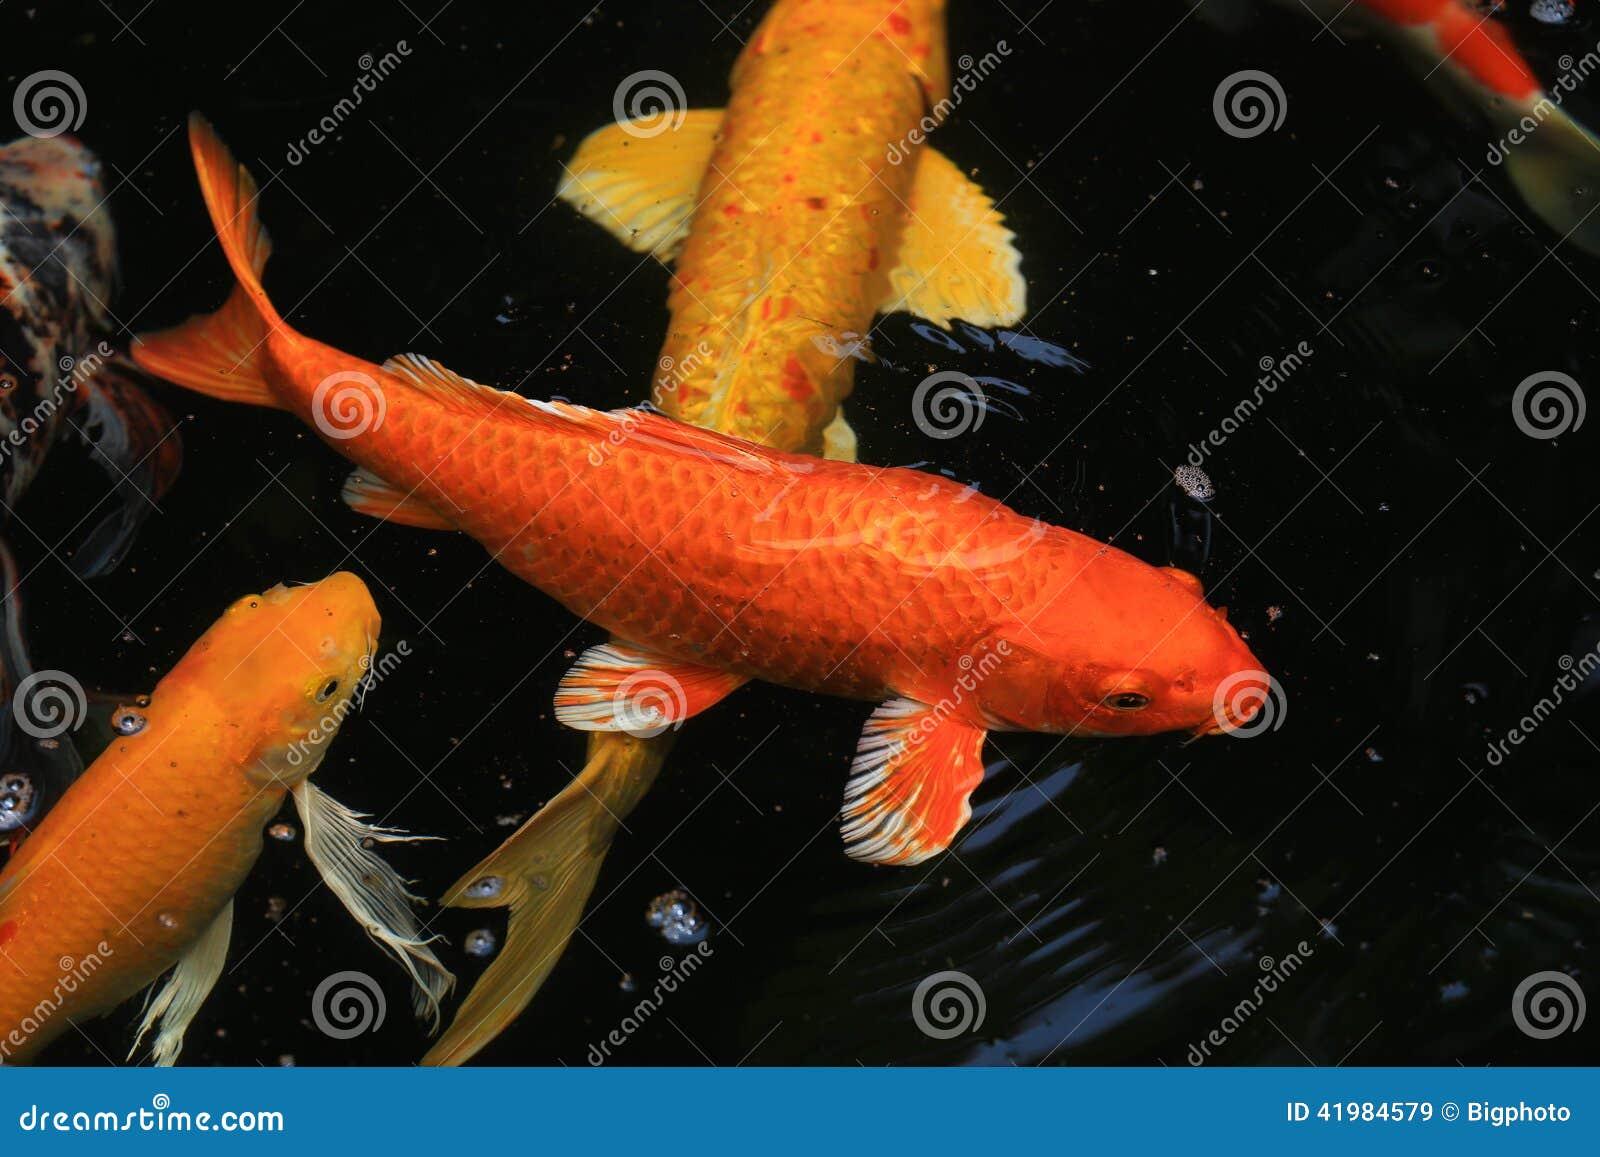 Koi Fish Swimming In The Pond Stock Image - Image of lake, swim ...